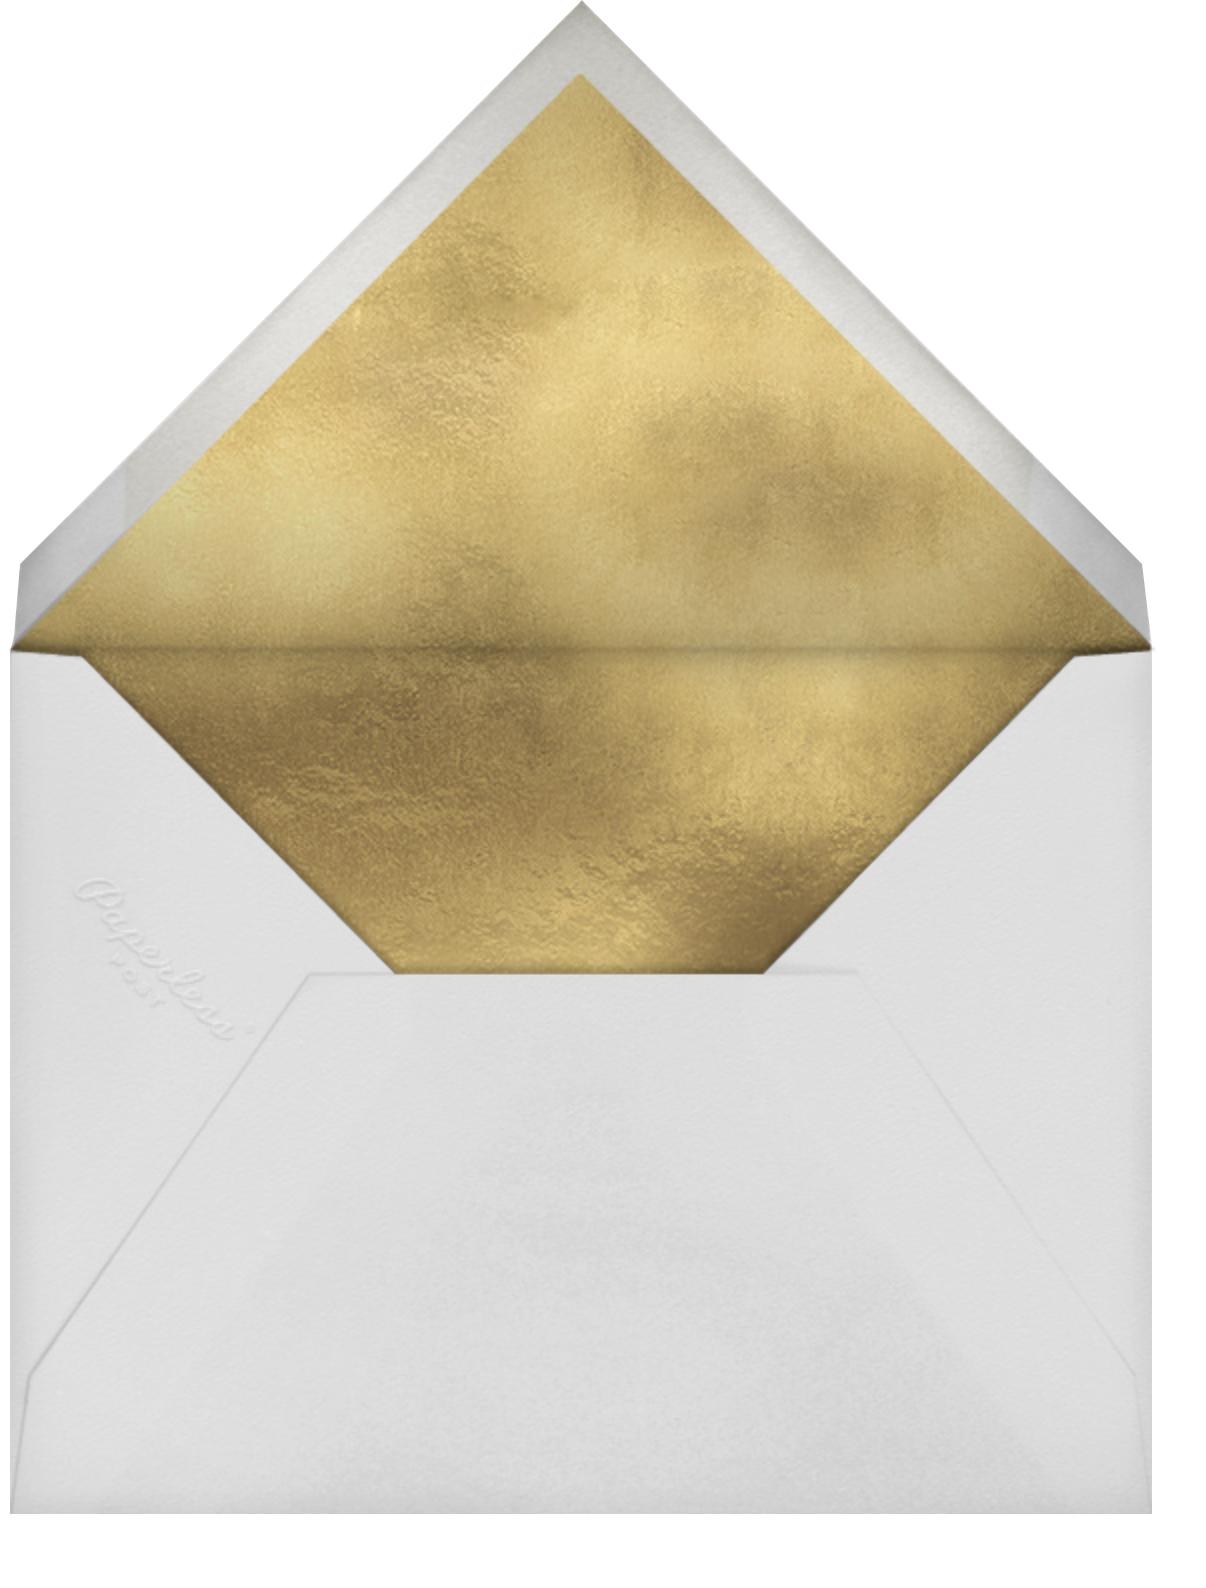 Illusion - Jonathan Adler - General entertaining - envelope back